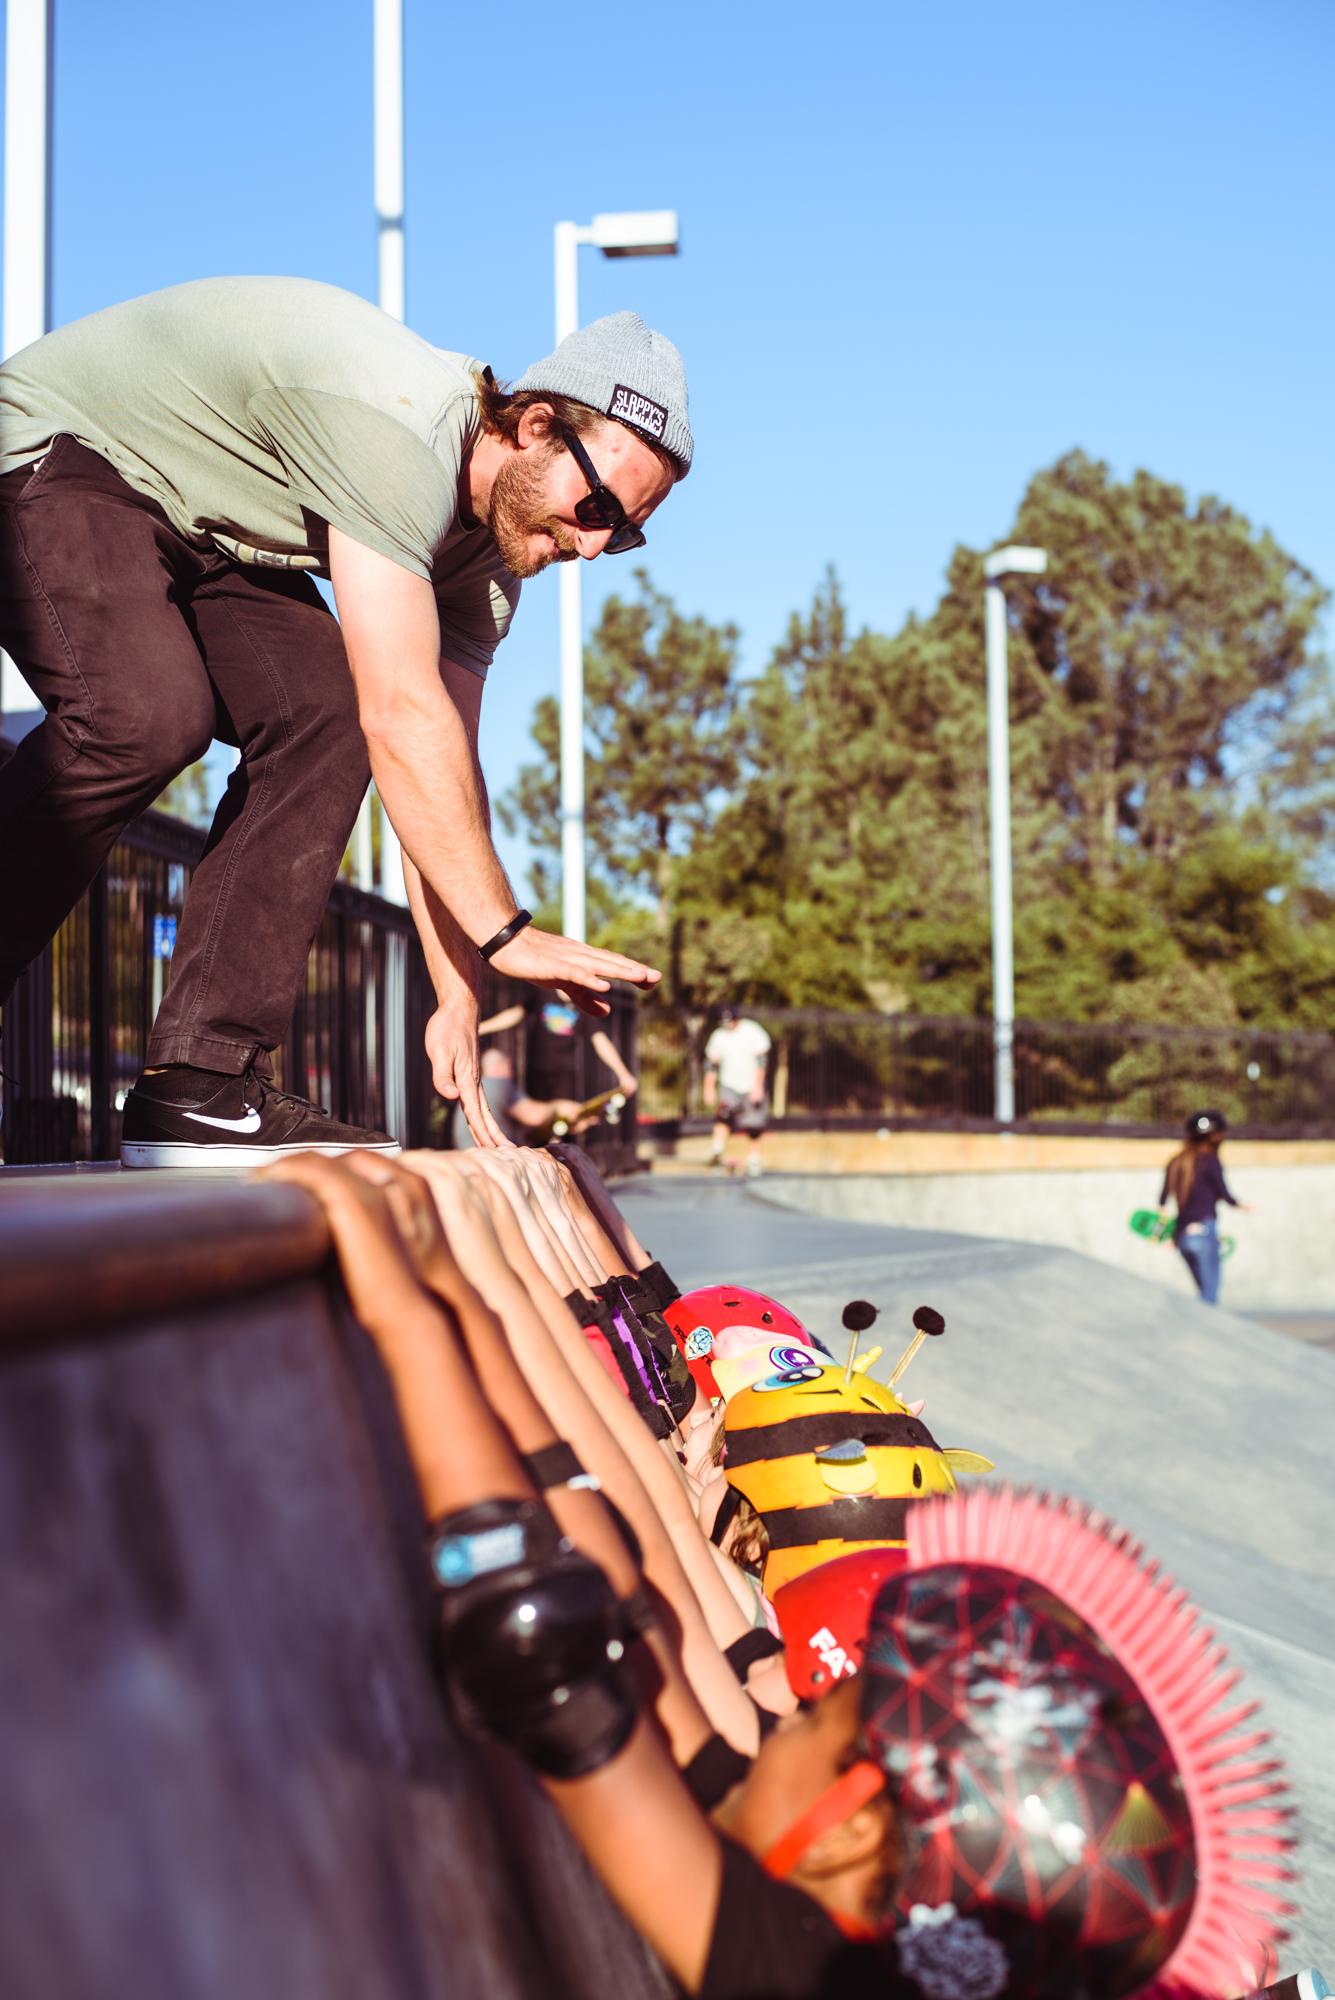 Skateboard Birthday Party-23.jpg